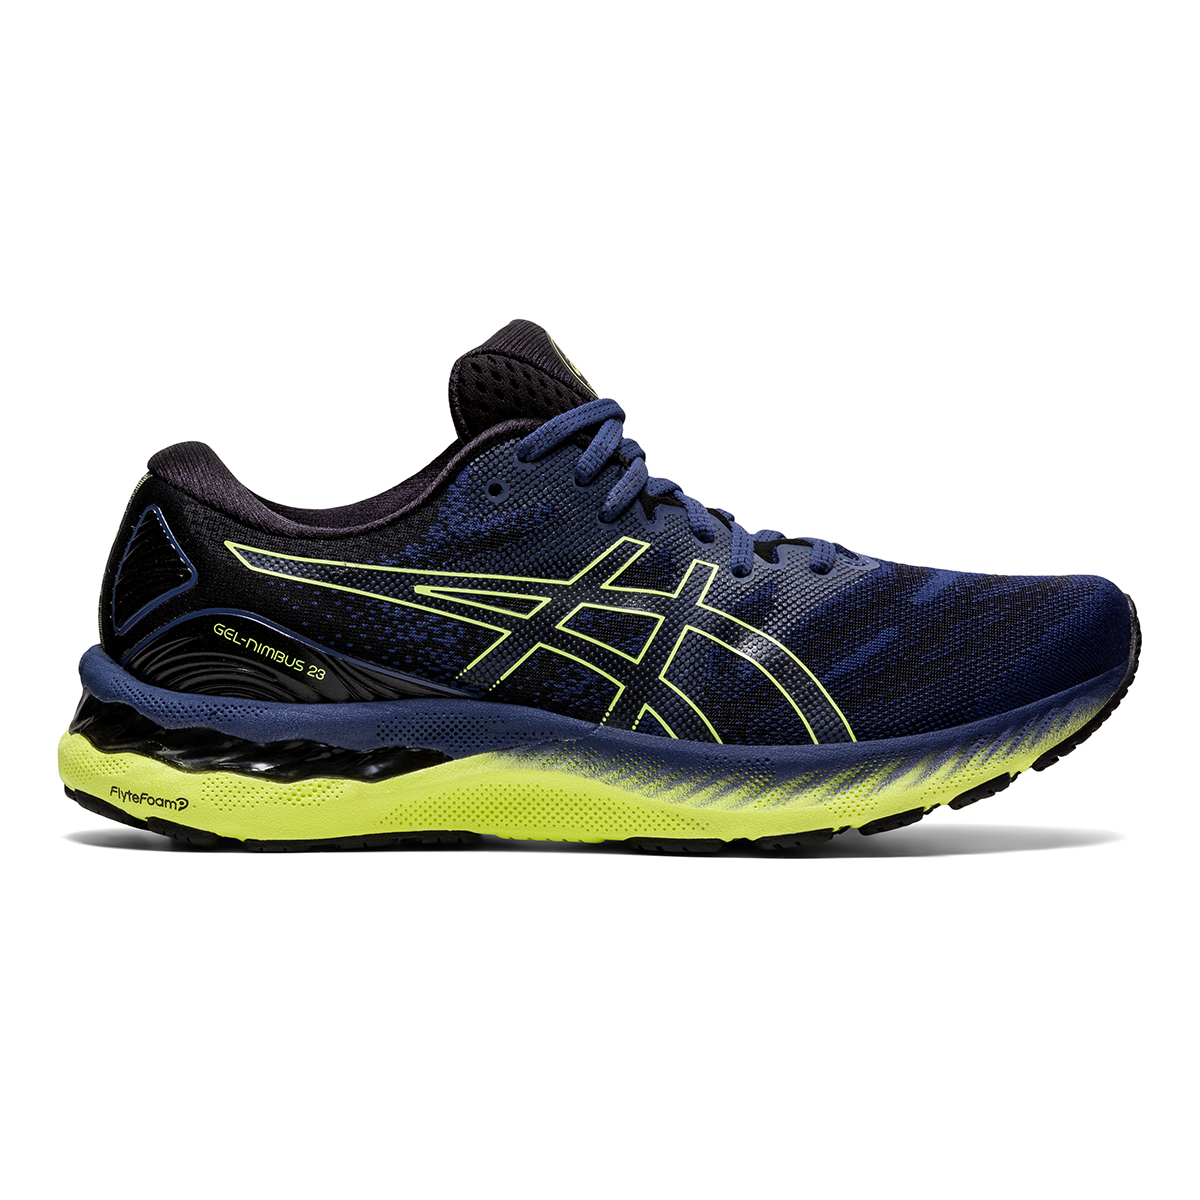 Men's Asics Gel-Nimbus 23 Running Shoe - Color: Thunder Blue - Size: 7 - Width: Regular, Thunder Blue, large, image 1